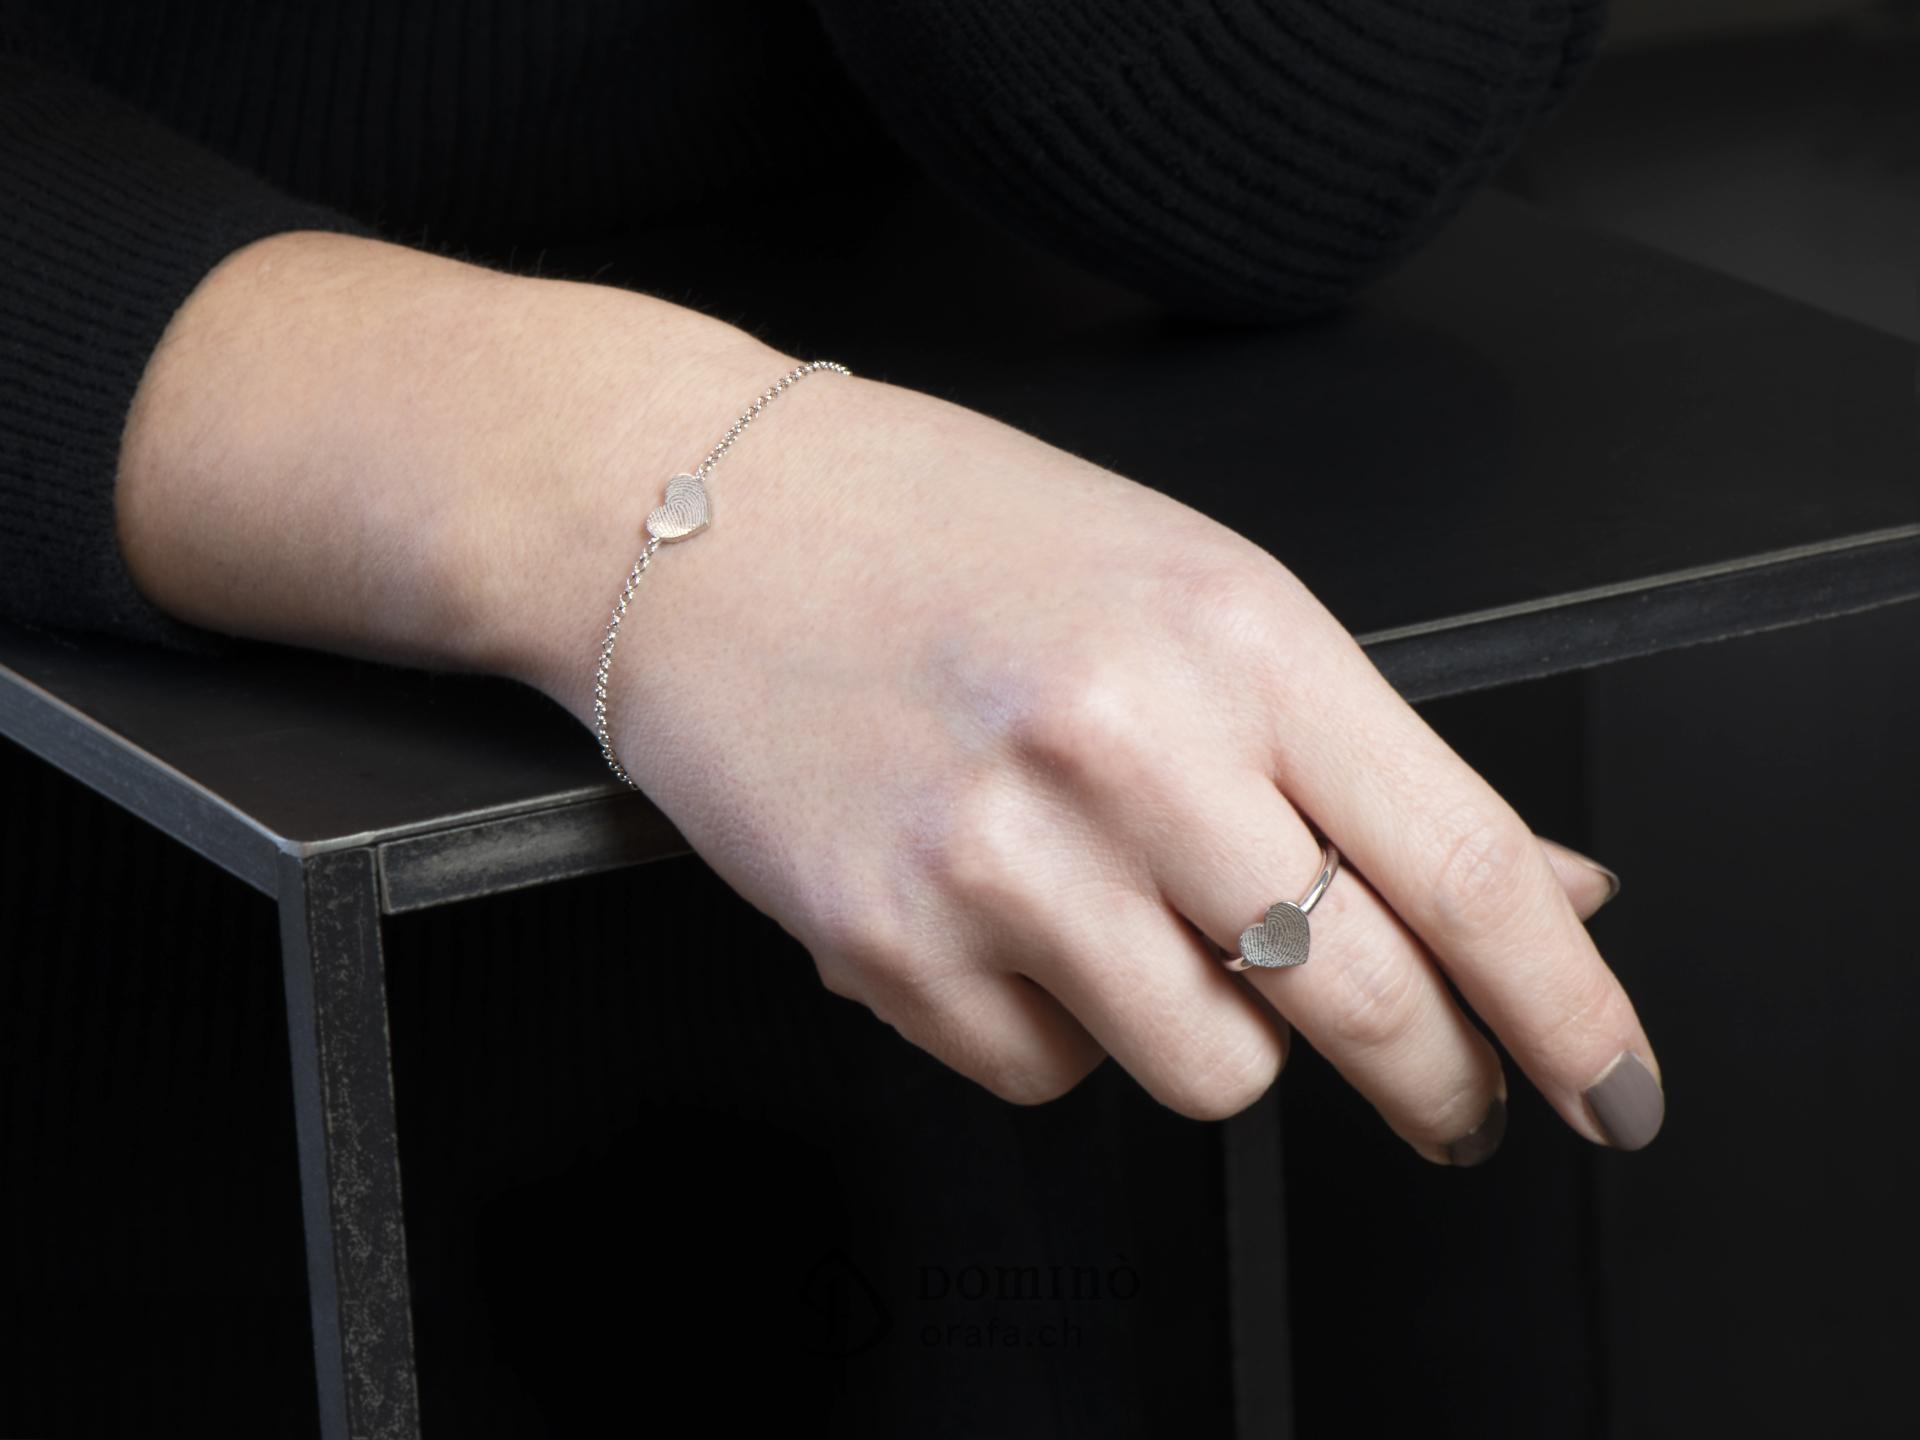 braccialetto-cuore-vostra-impronta-digitale-1